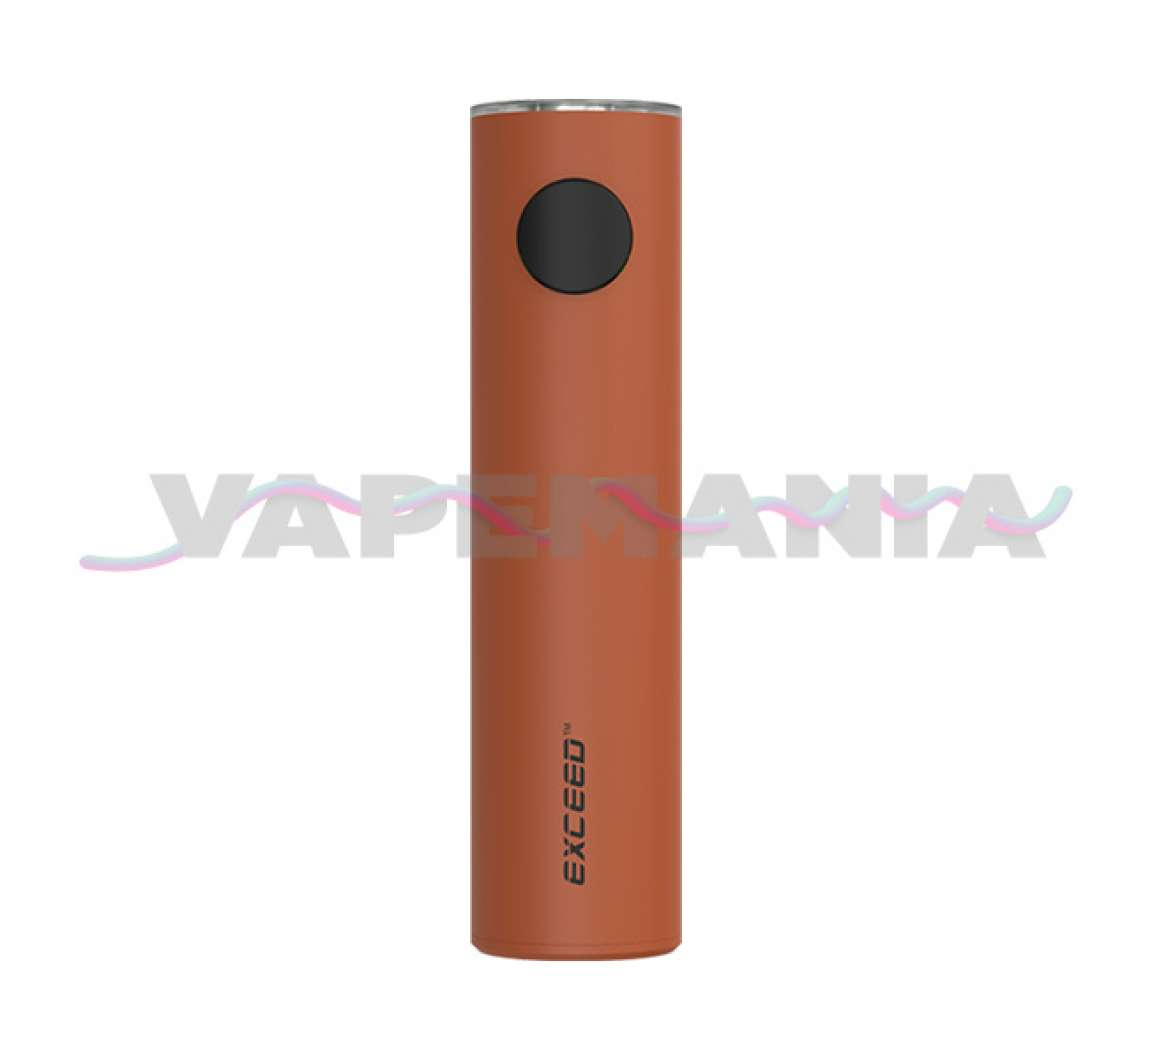 Baterie Joyetech Exceed D19 – 1500mAh oranžová